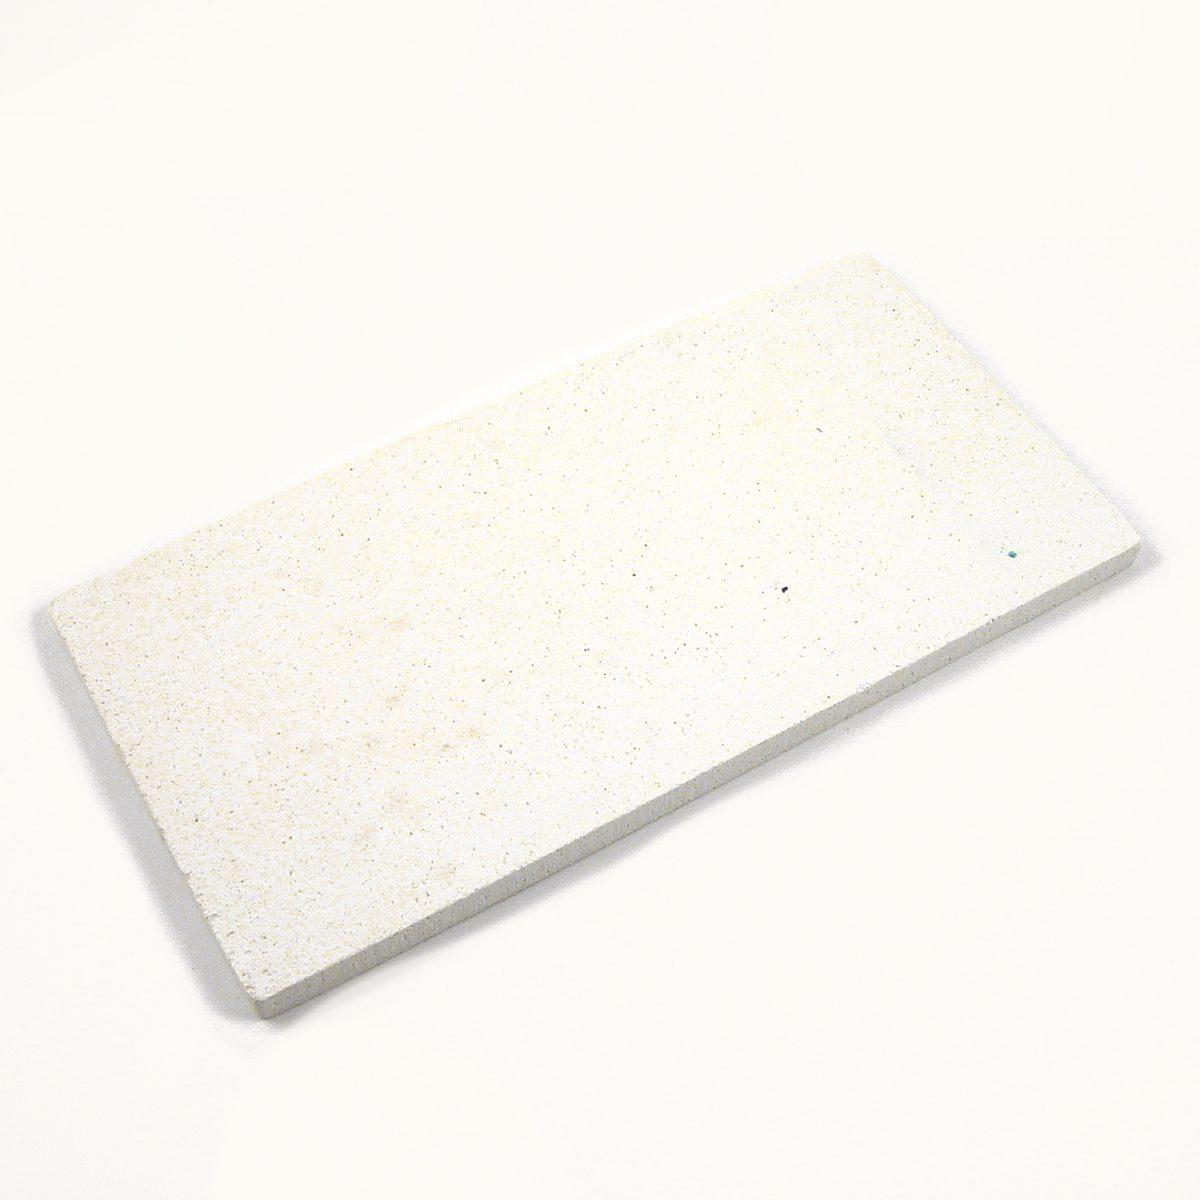 asbestos free soldering board 6 x 12